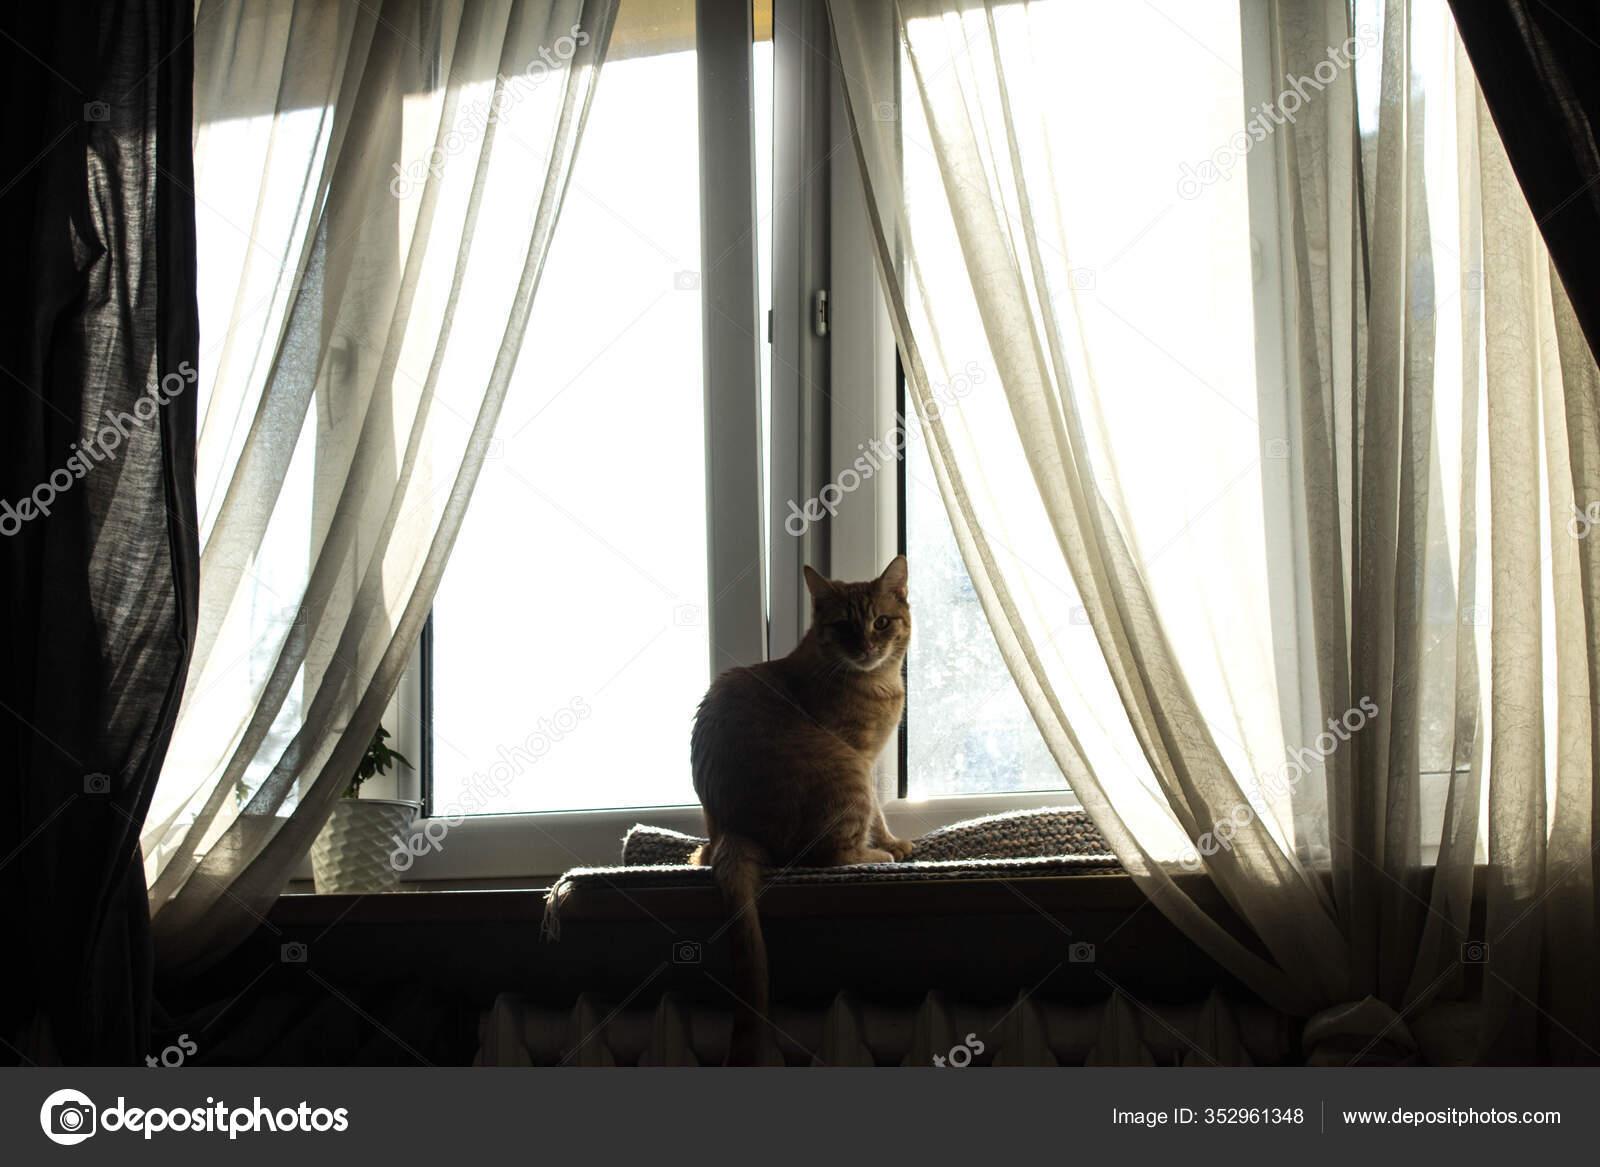 Cat Sitting Window Large Window Transparent Curtains Stock Photo C 9905099 Ukr Net 352961348